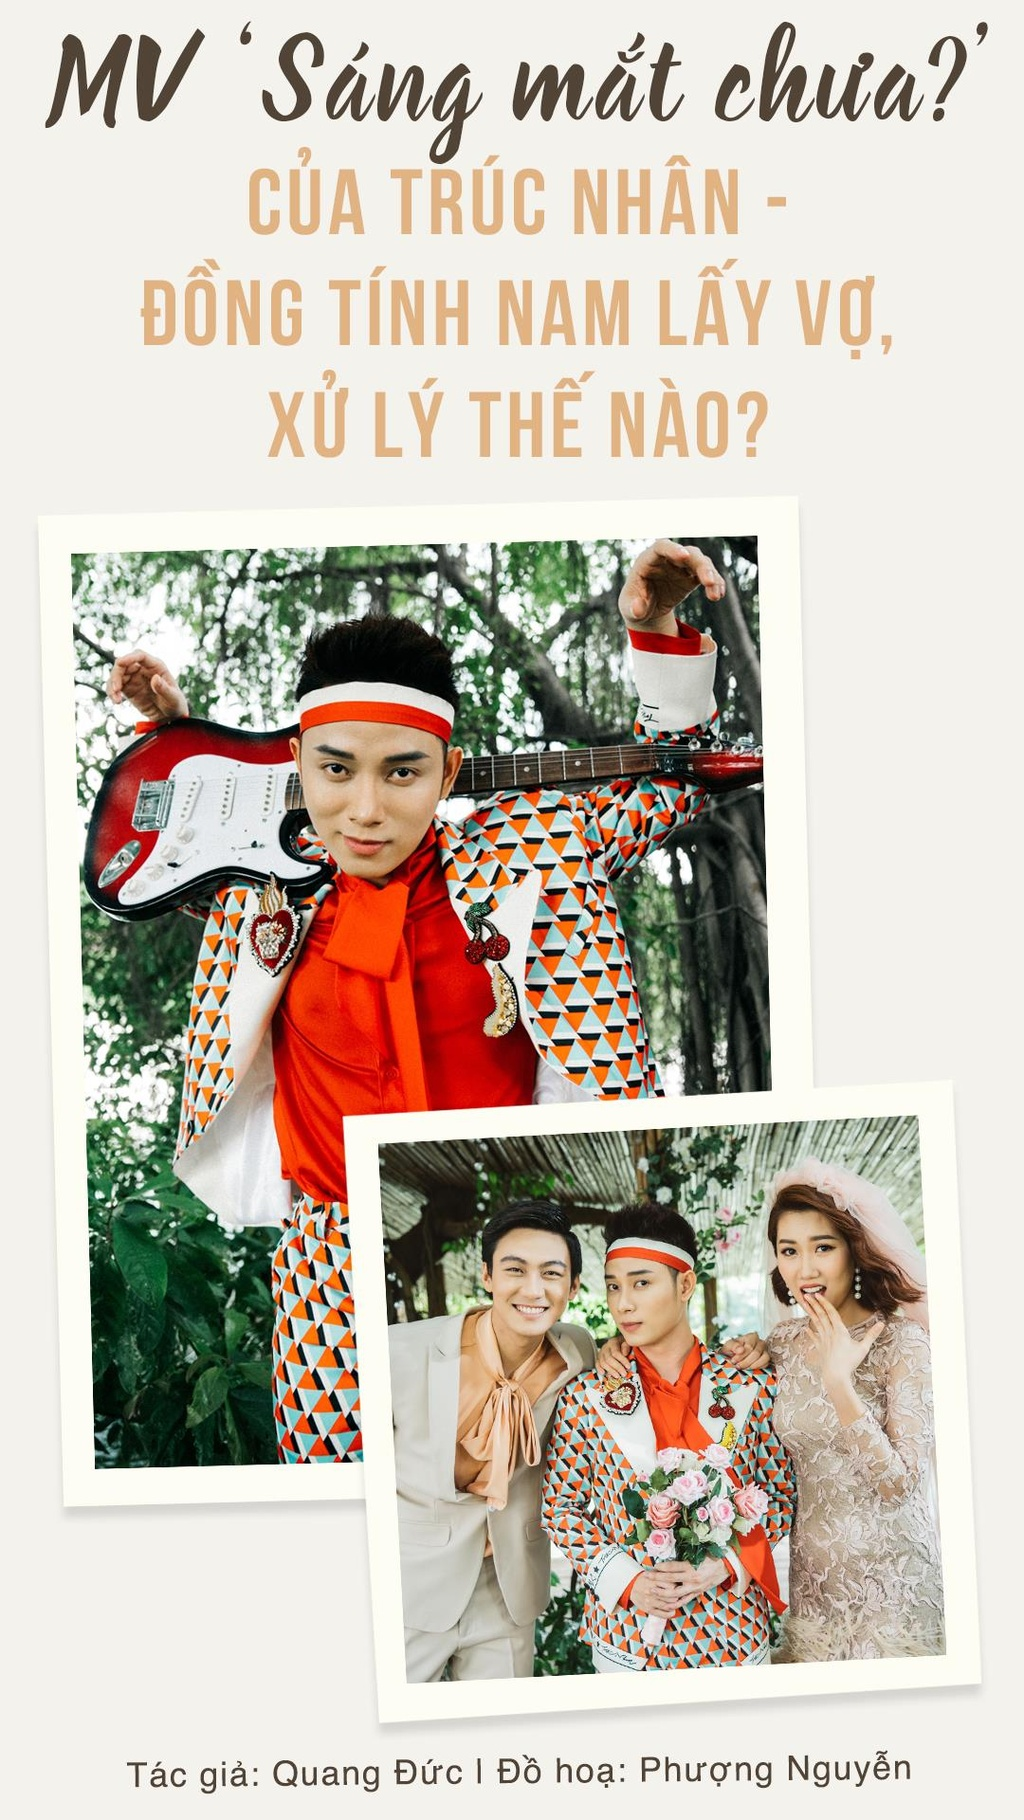 'Sang mat chua' cua Truc Nhan - dong tinh nam lay vo, xu ly the nao? hinh anh 1